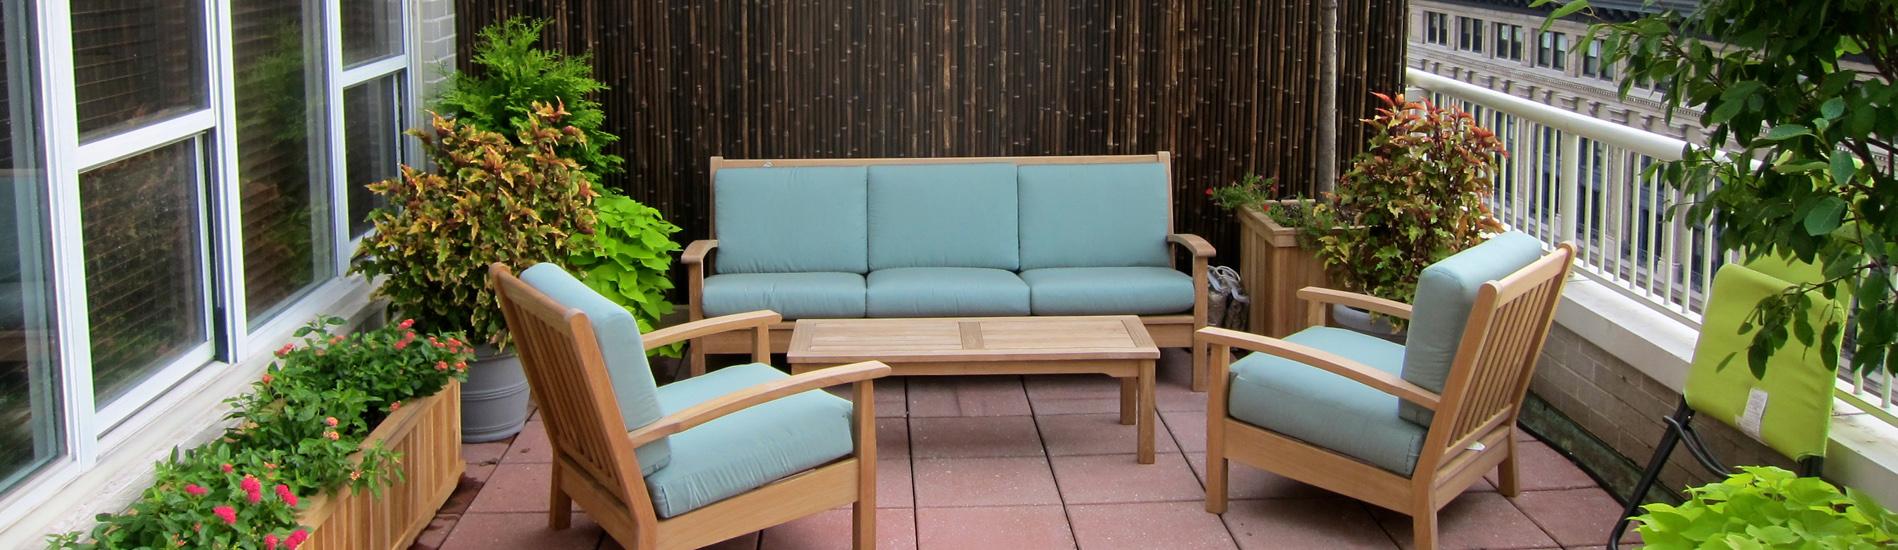 Custom furnishings and garden decor in NYC